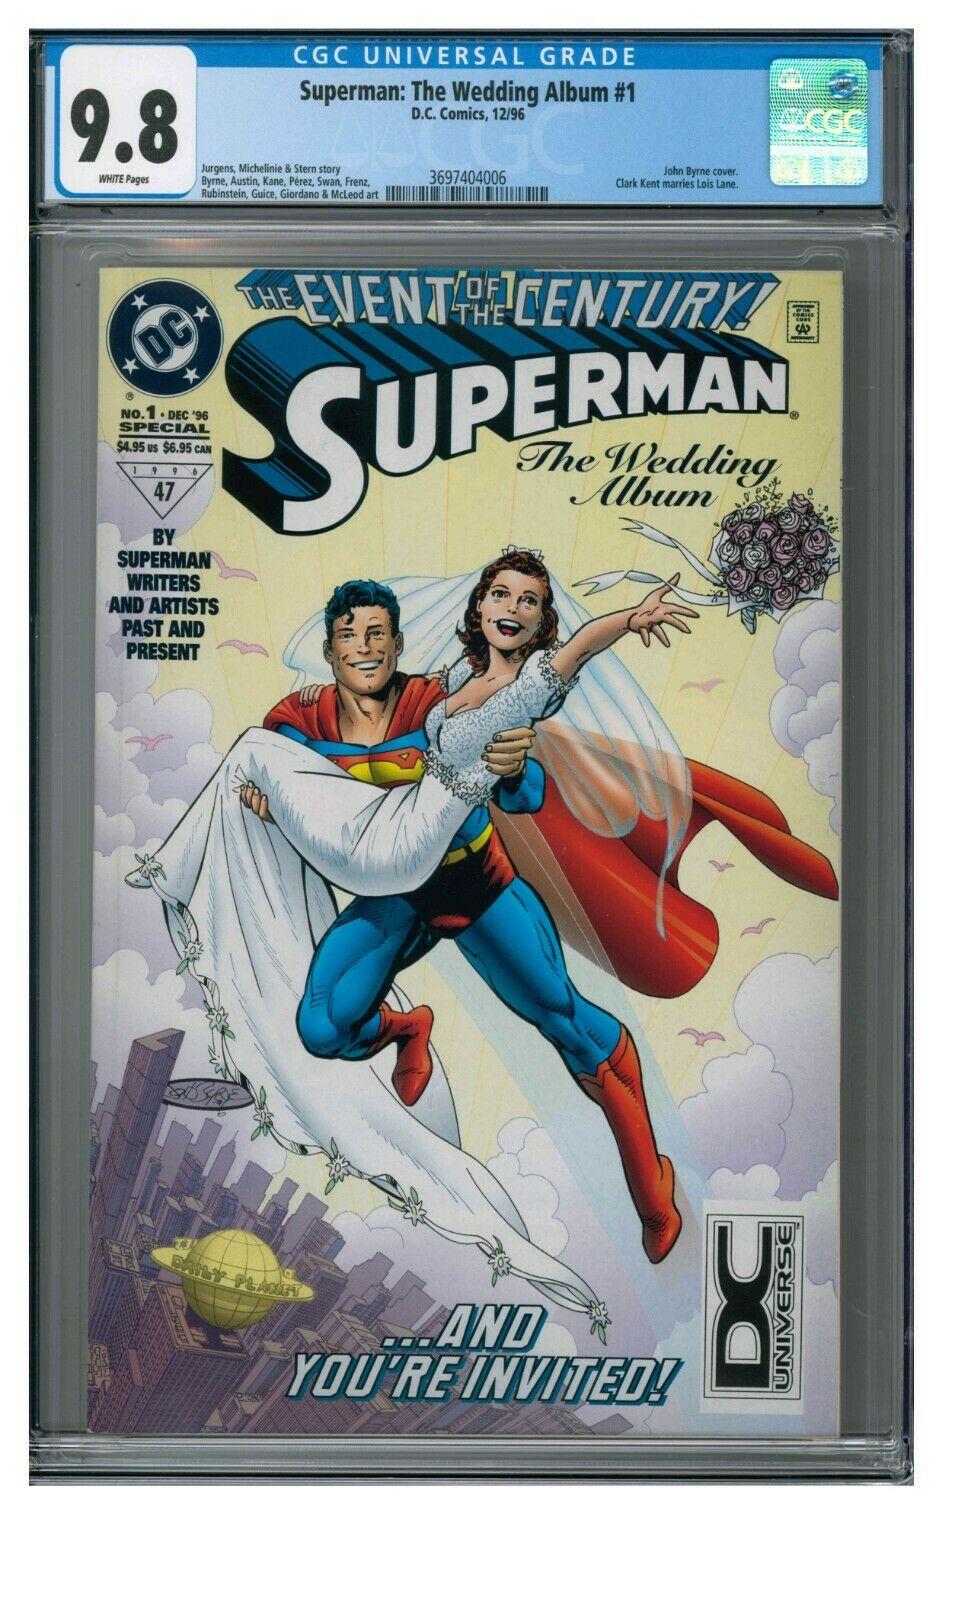 Superman: The Wedding Album #1 (1996) DC Universe Logo Variant CGC 9.8 GG954